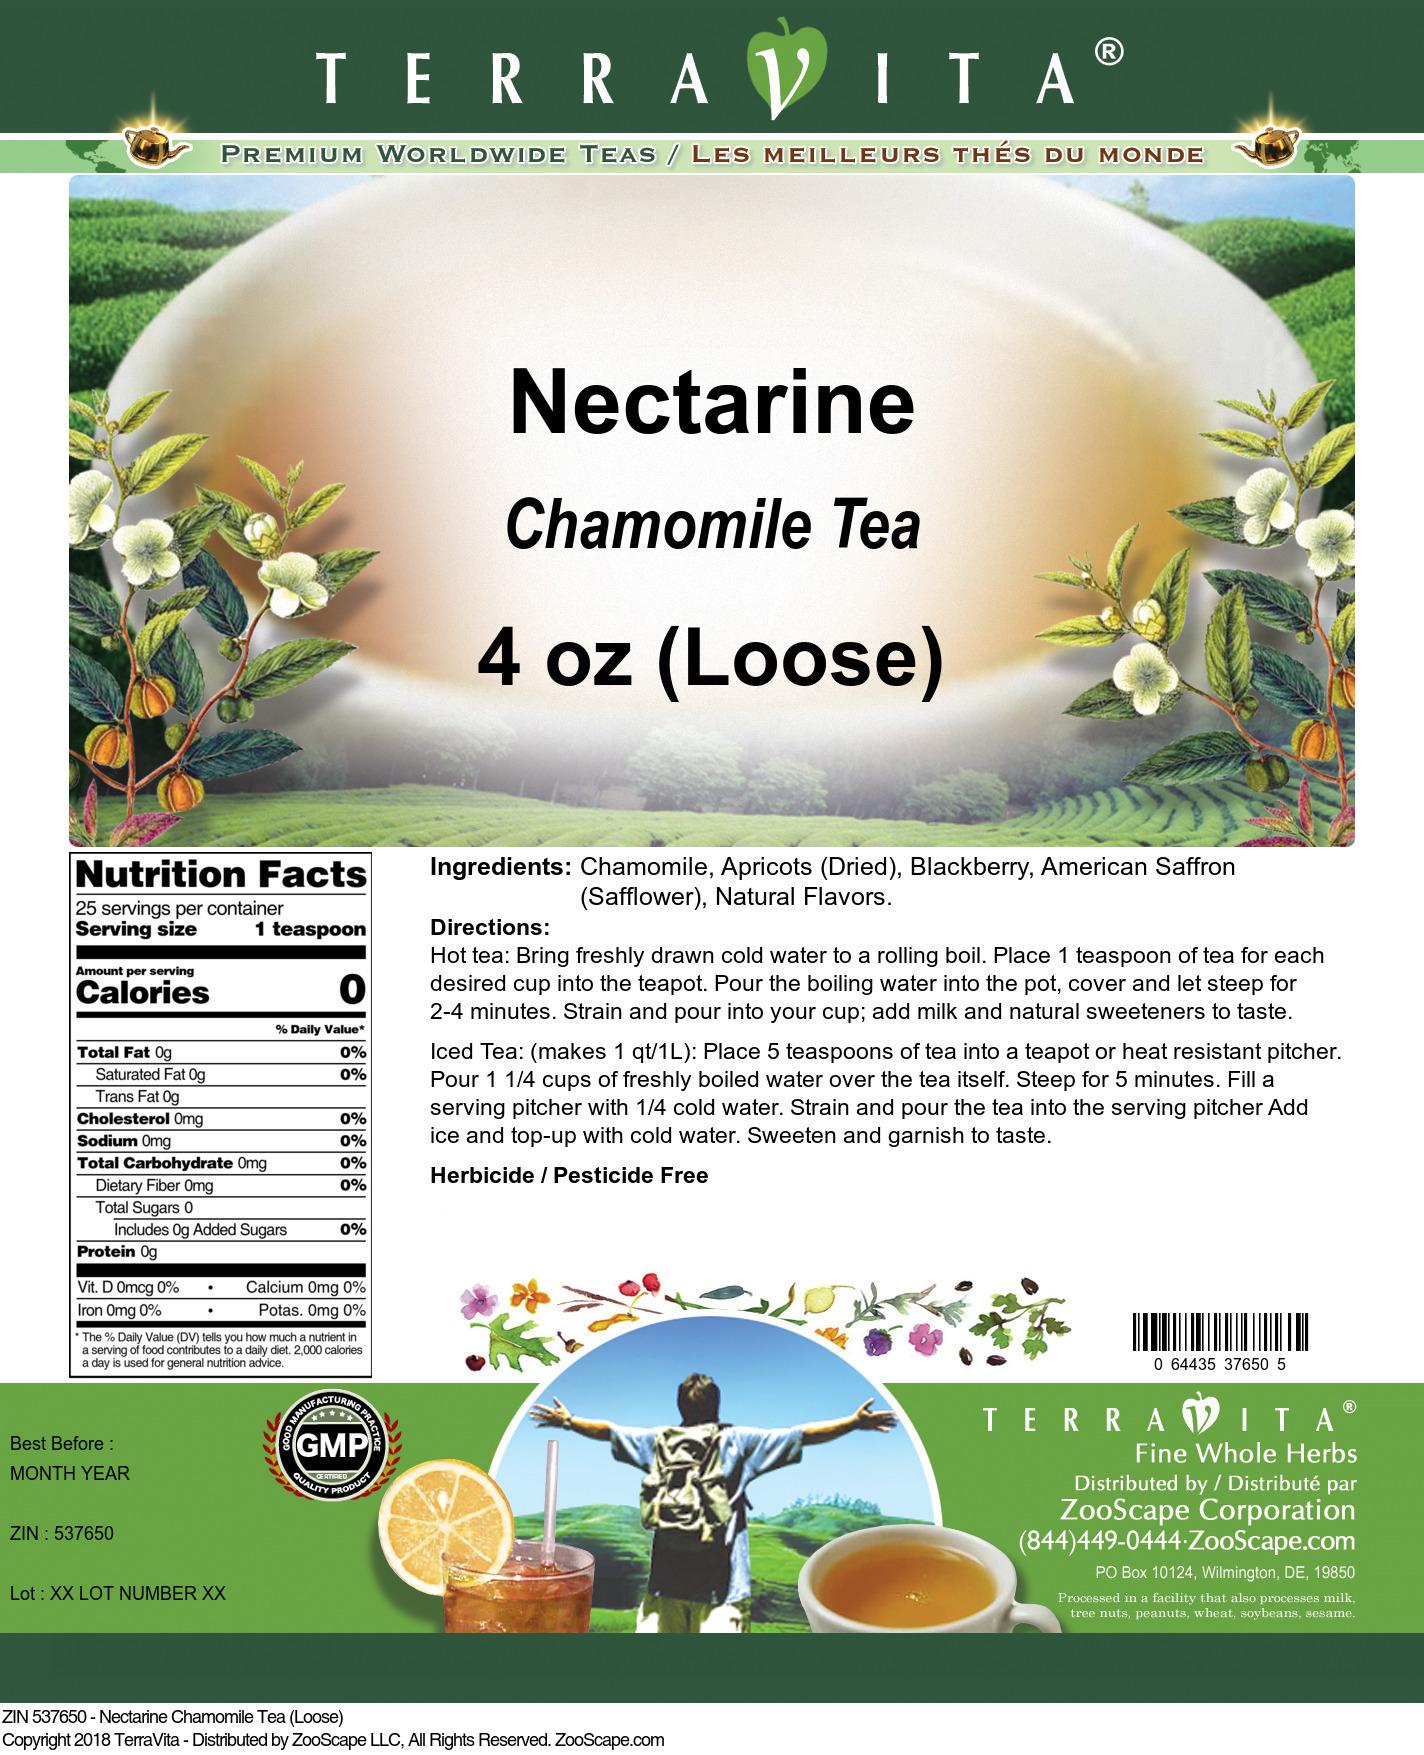 Nectarine Chamomile Tea (Loose)